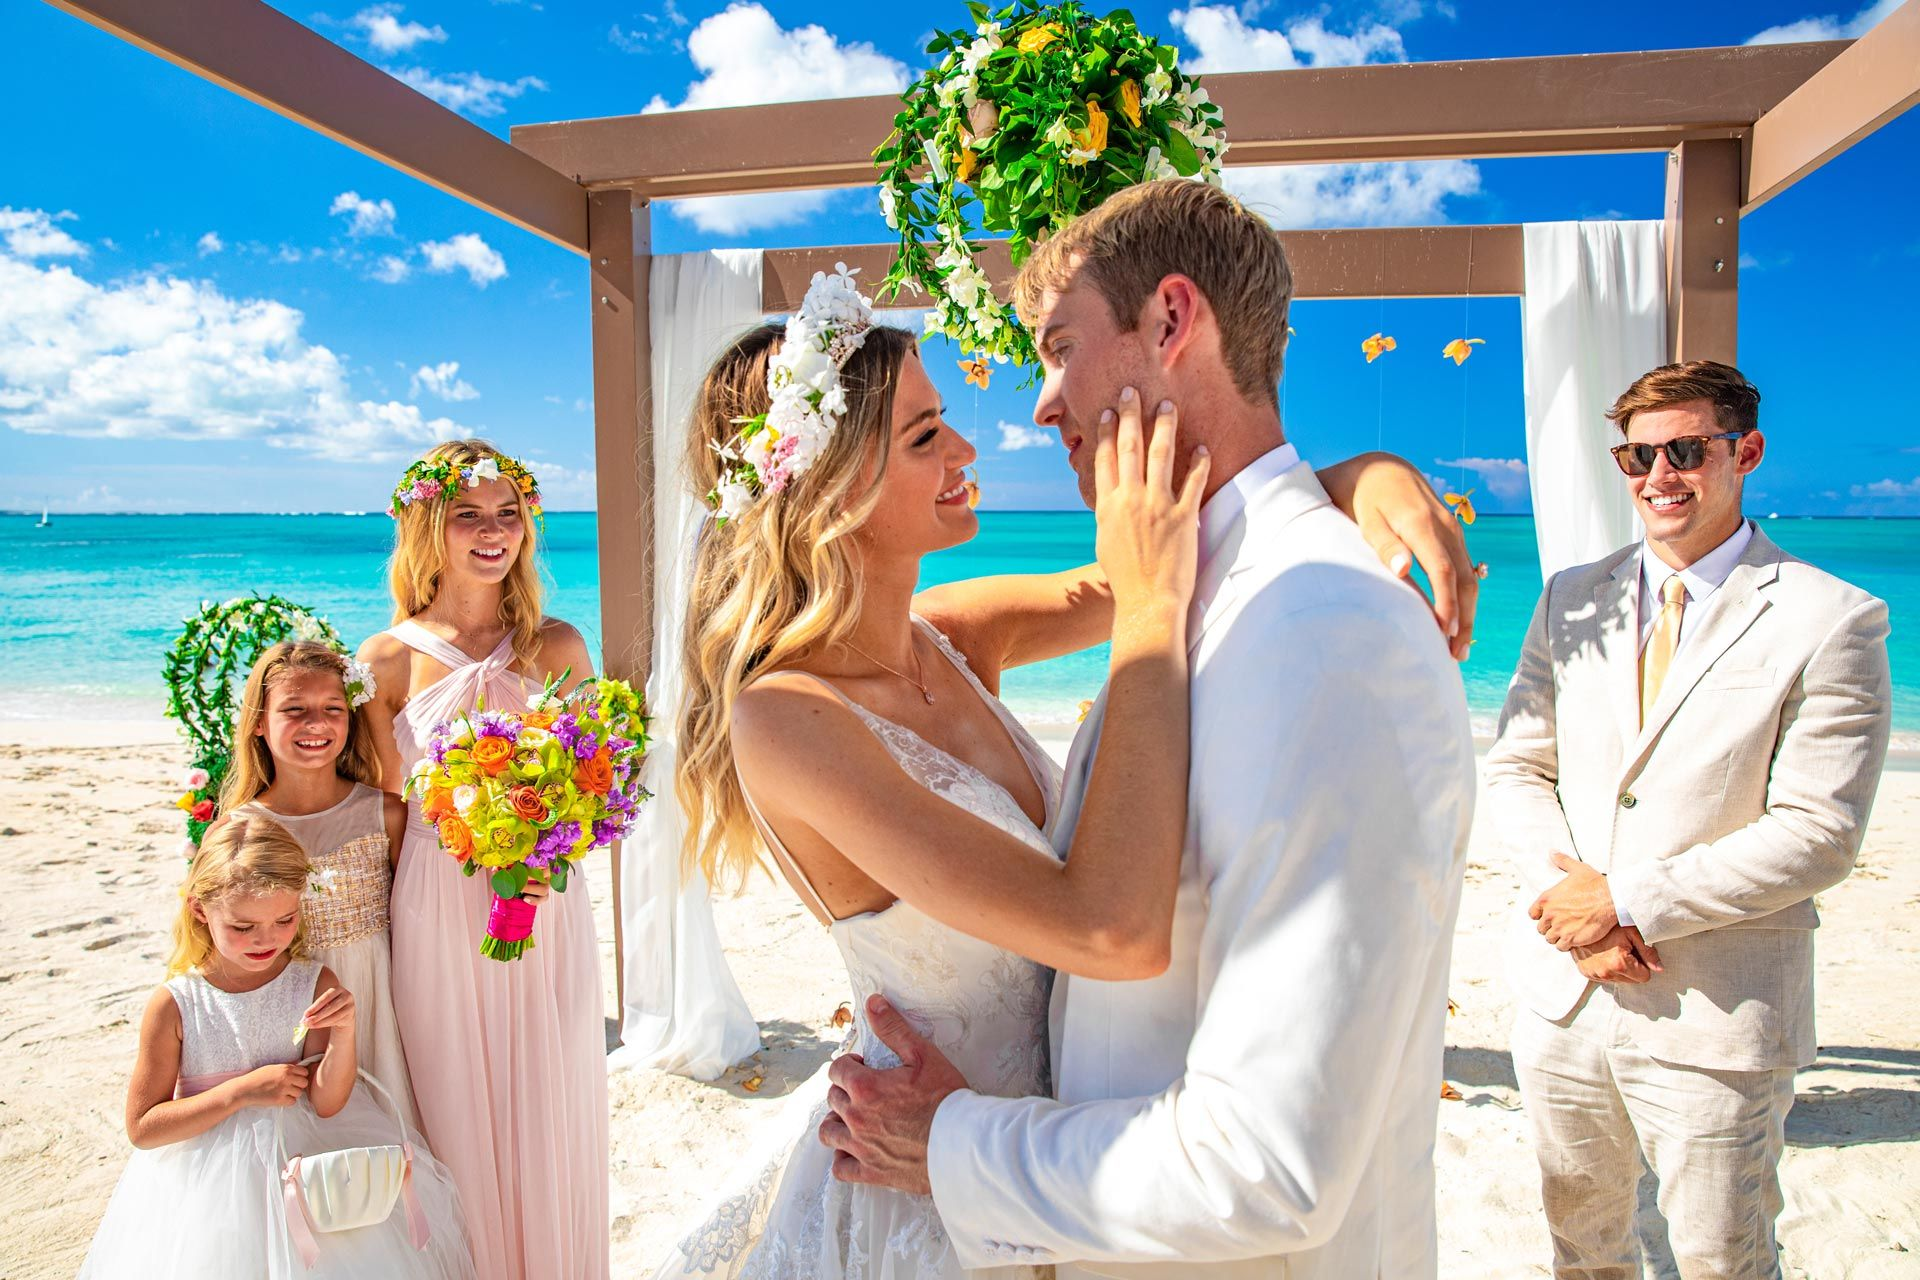 beaches turks and caicos wedding beach